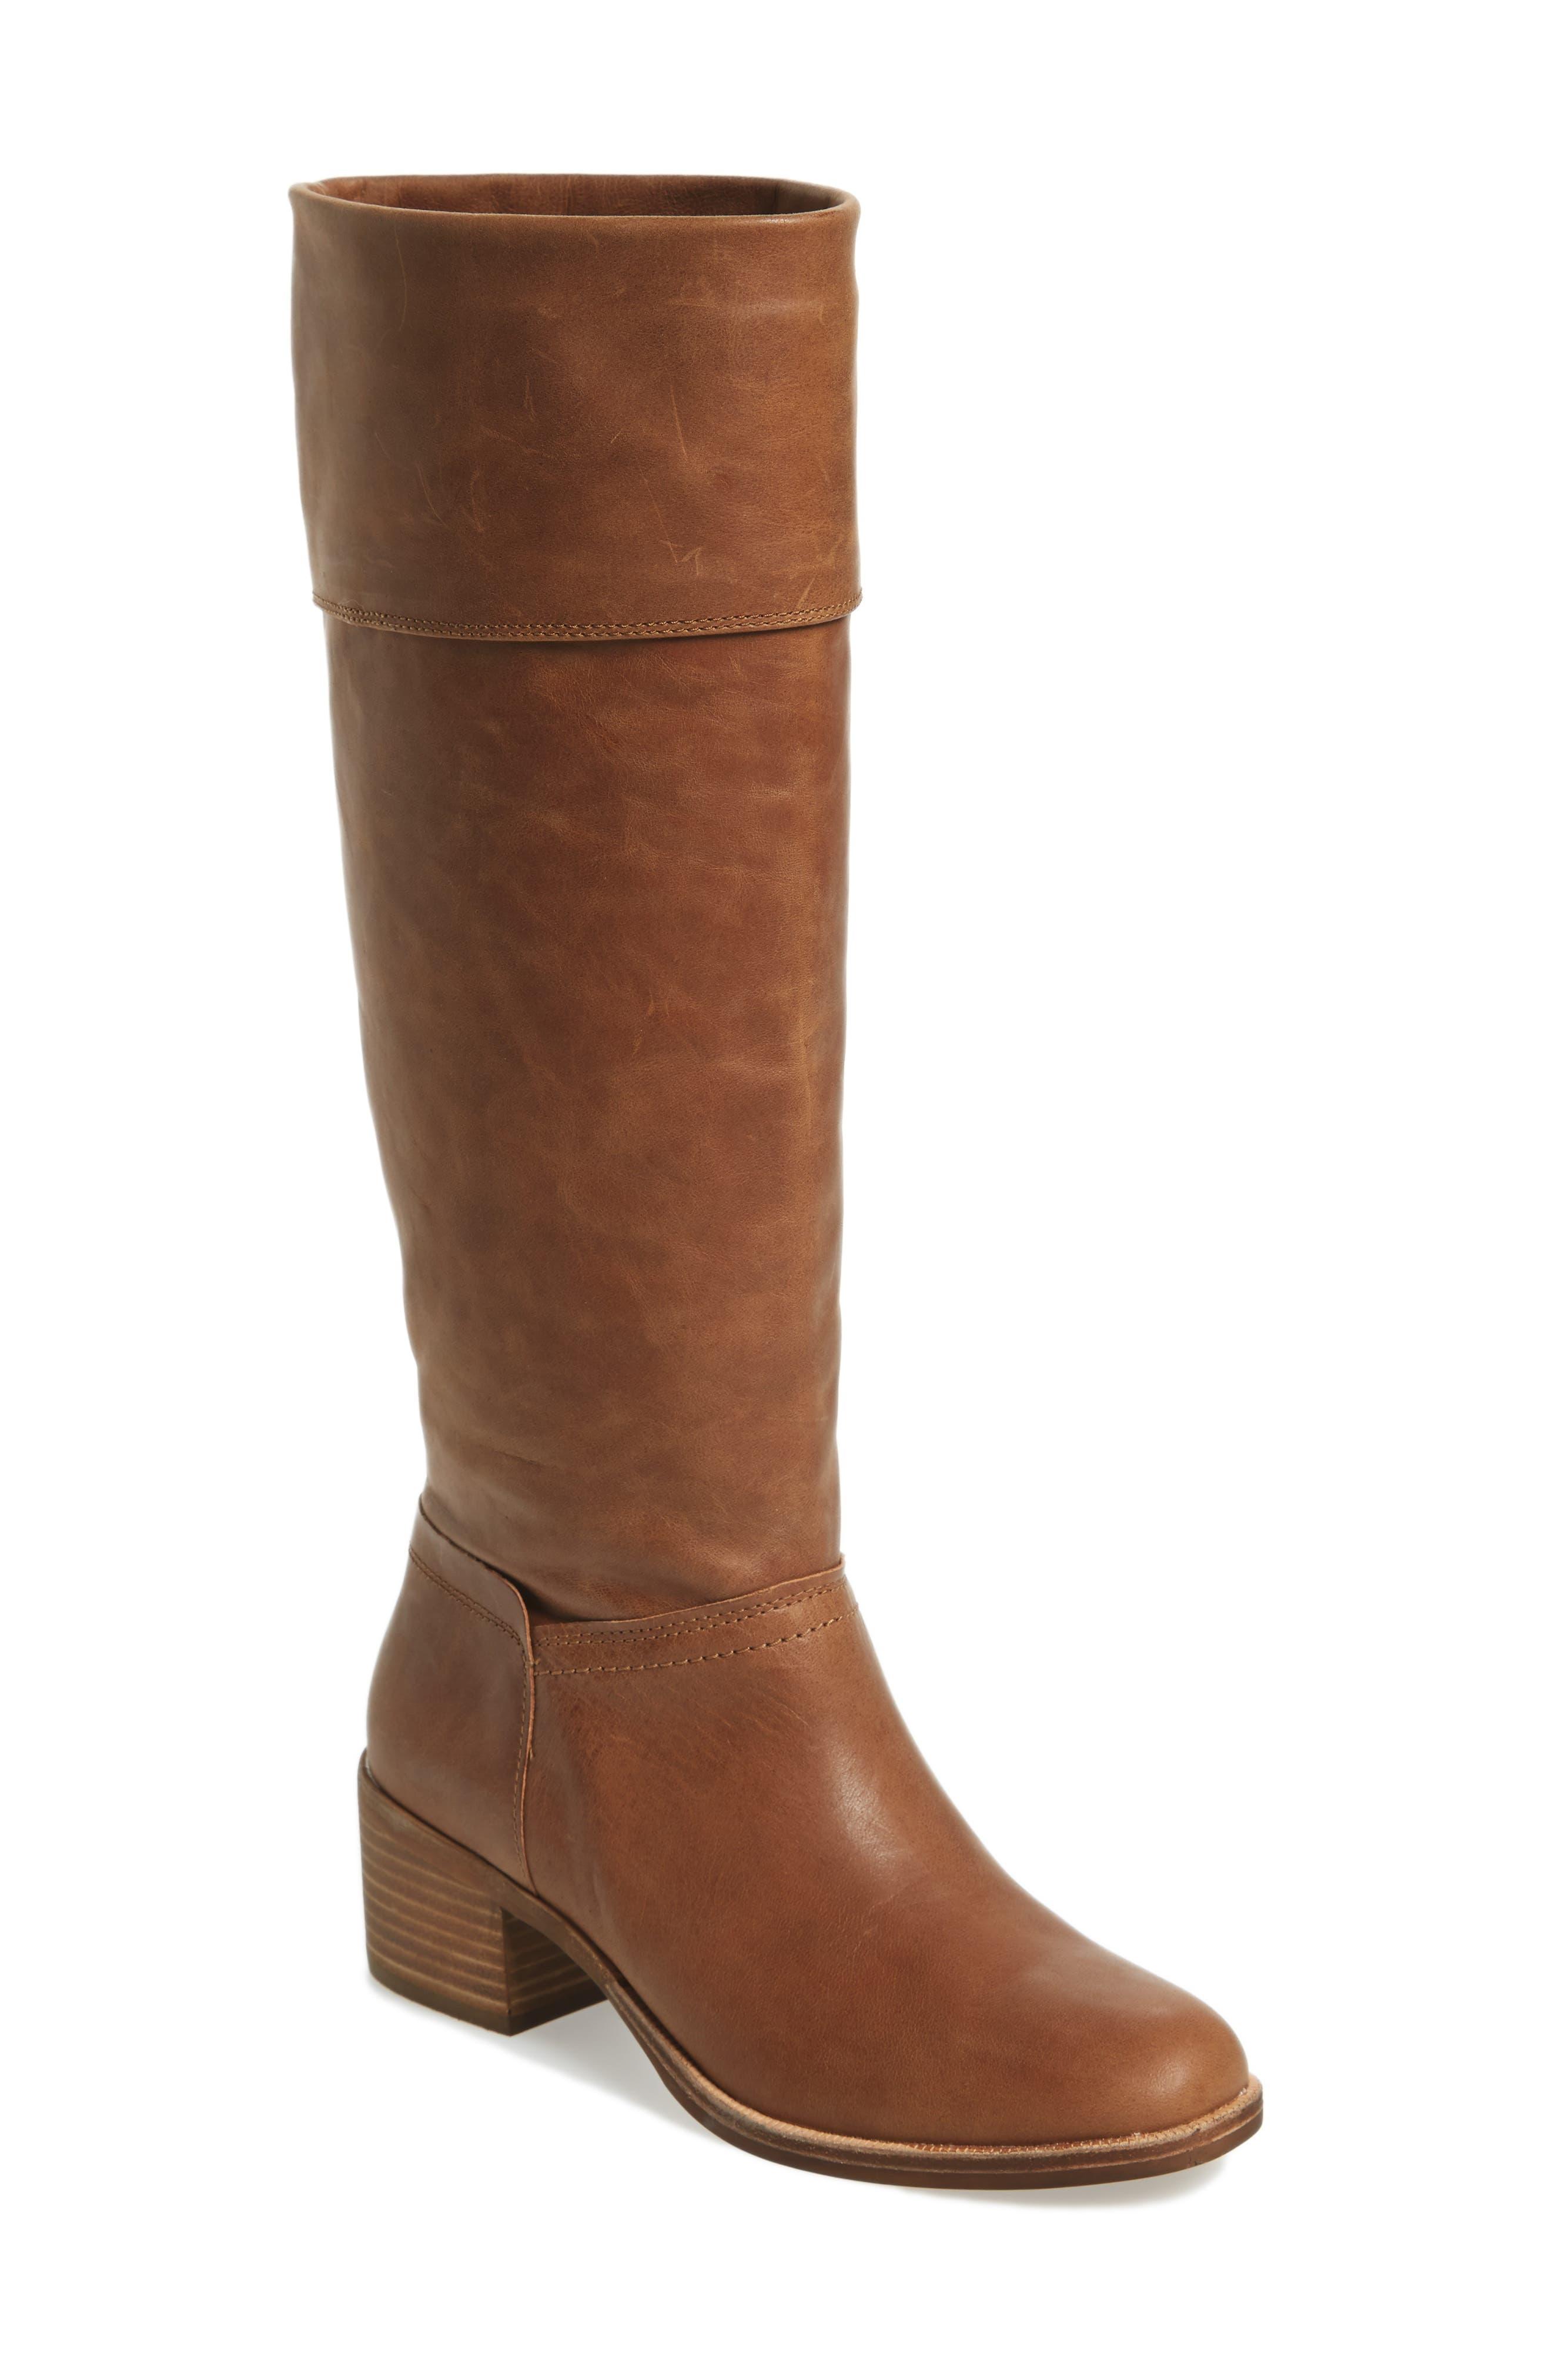 Alternate Image 1 Selected - UGG® Carlin Tall Boot (Women)